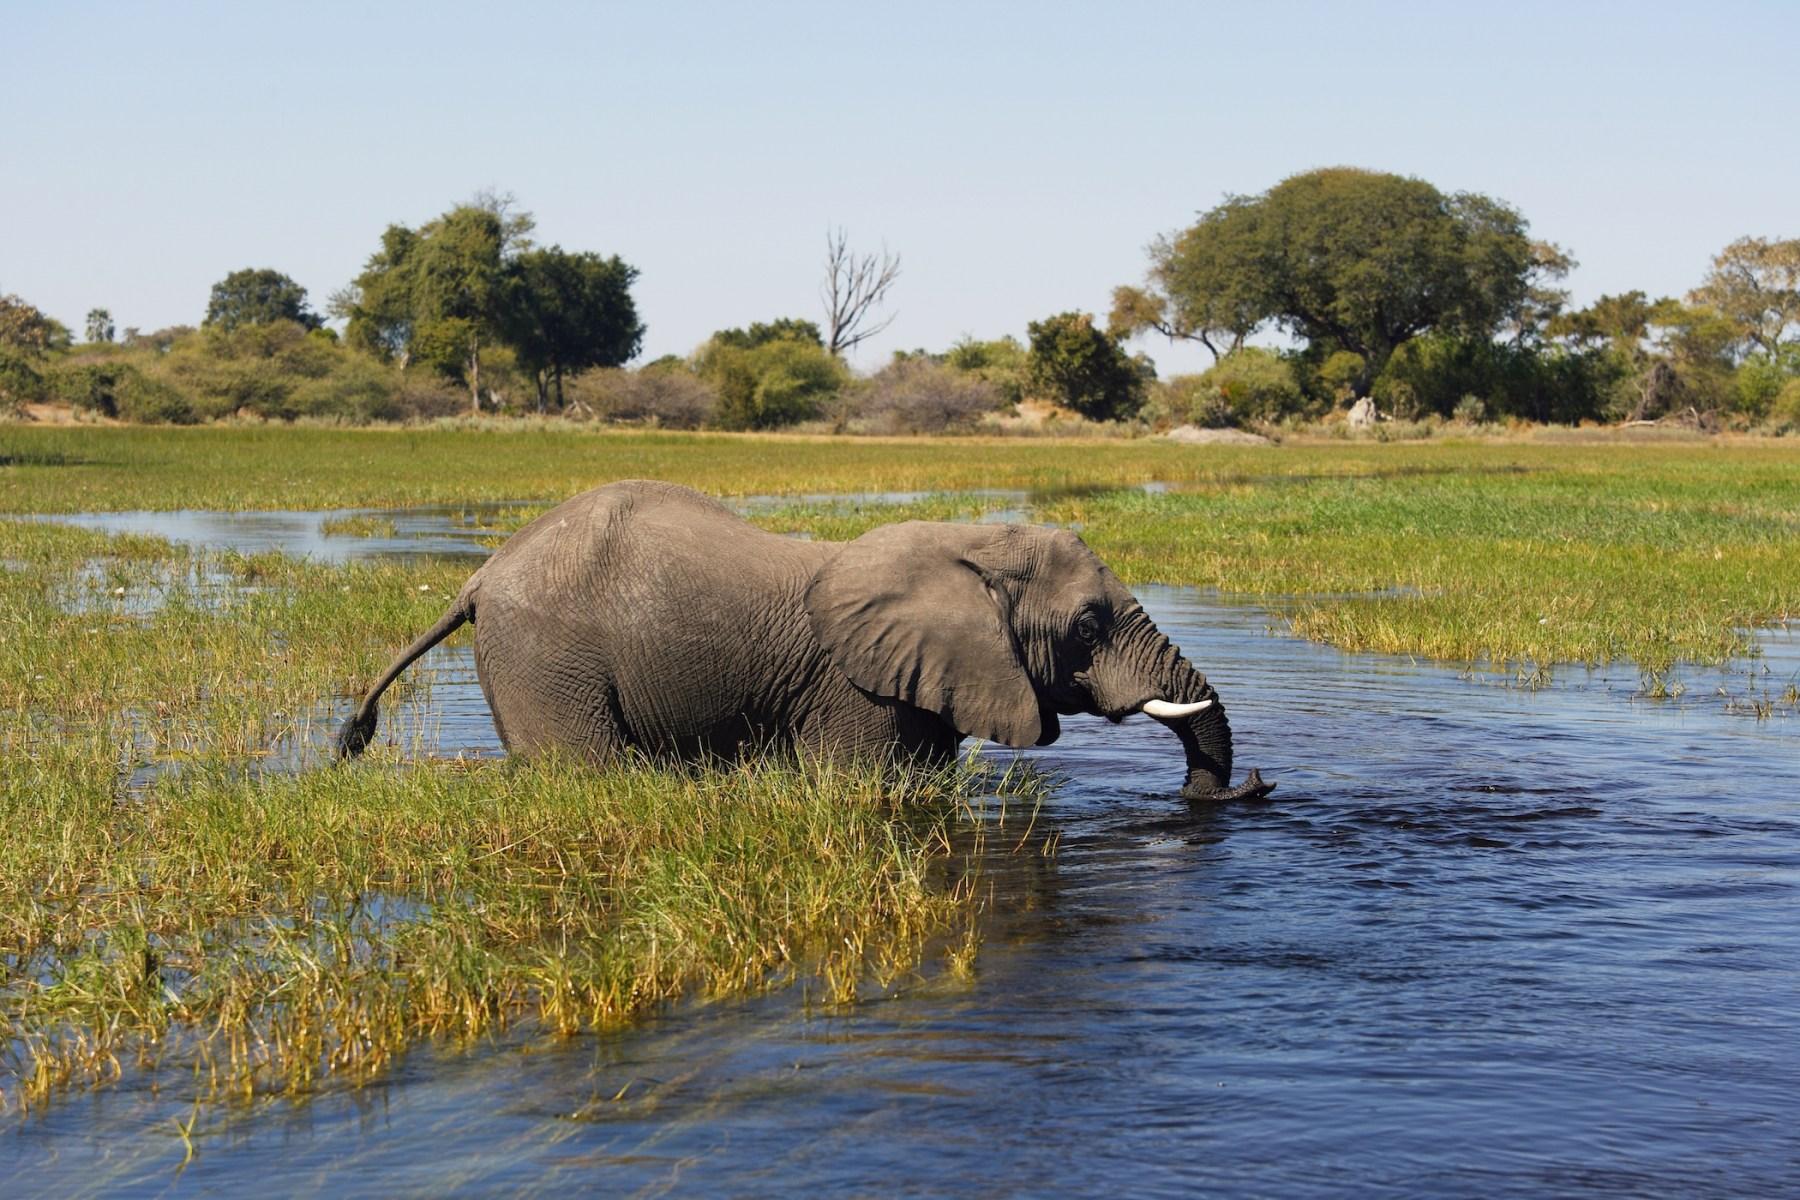 Botswana. Okavango Delta. Xigera Camp. Safari. Elephant. (Photo by: Marka/UIG via Getty Images)